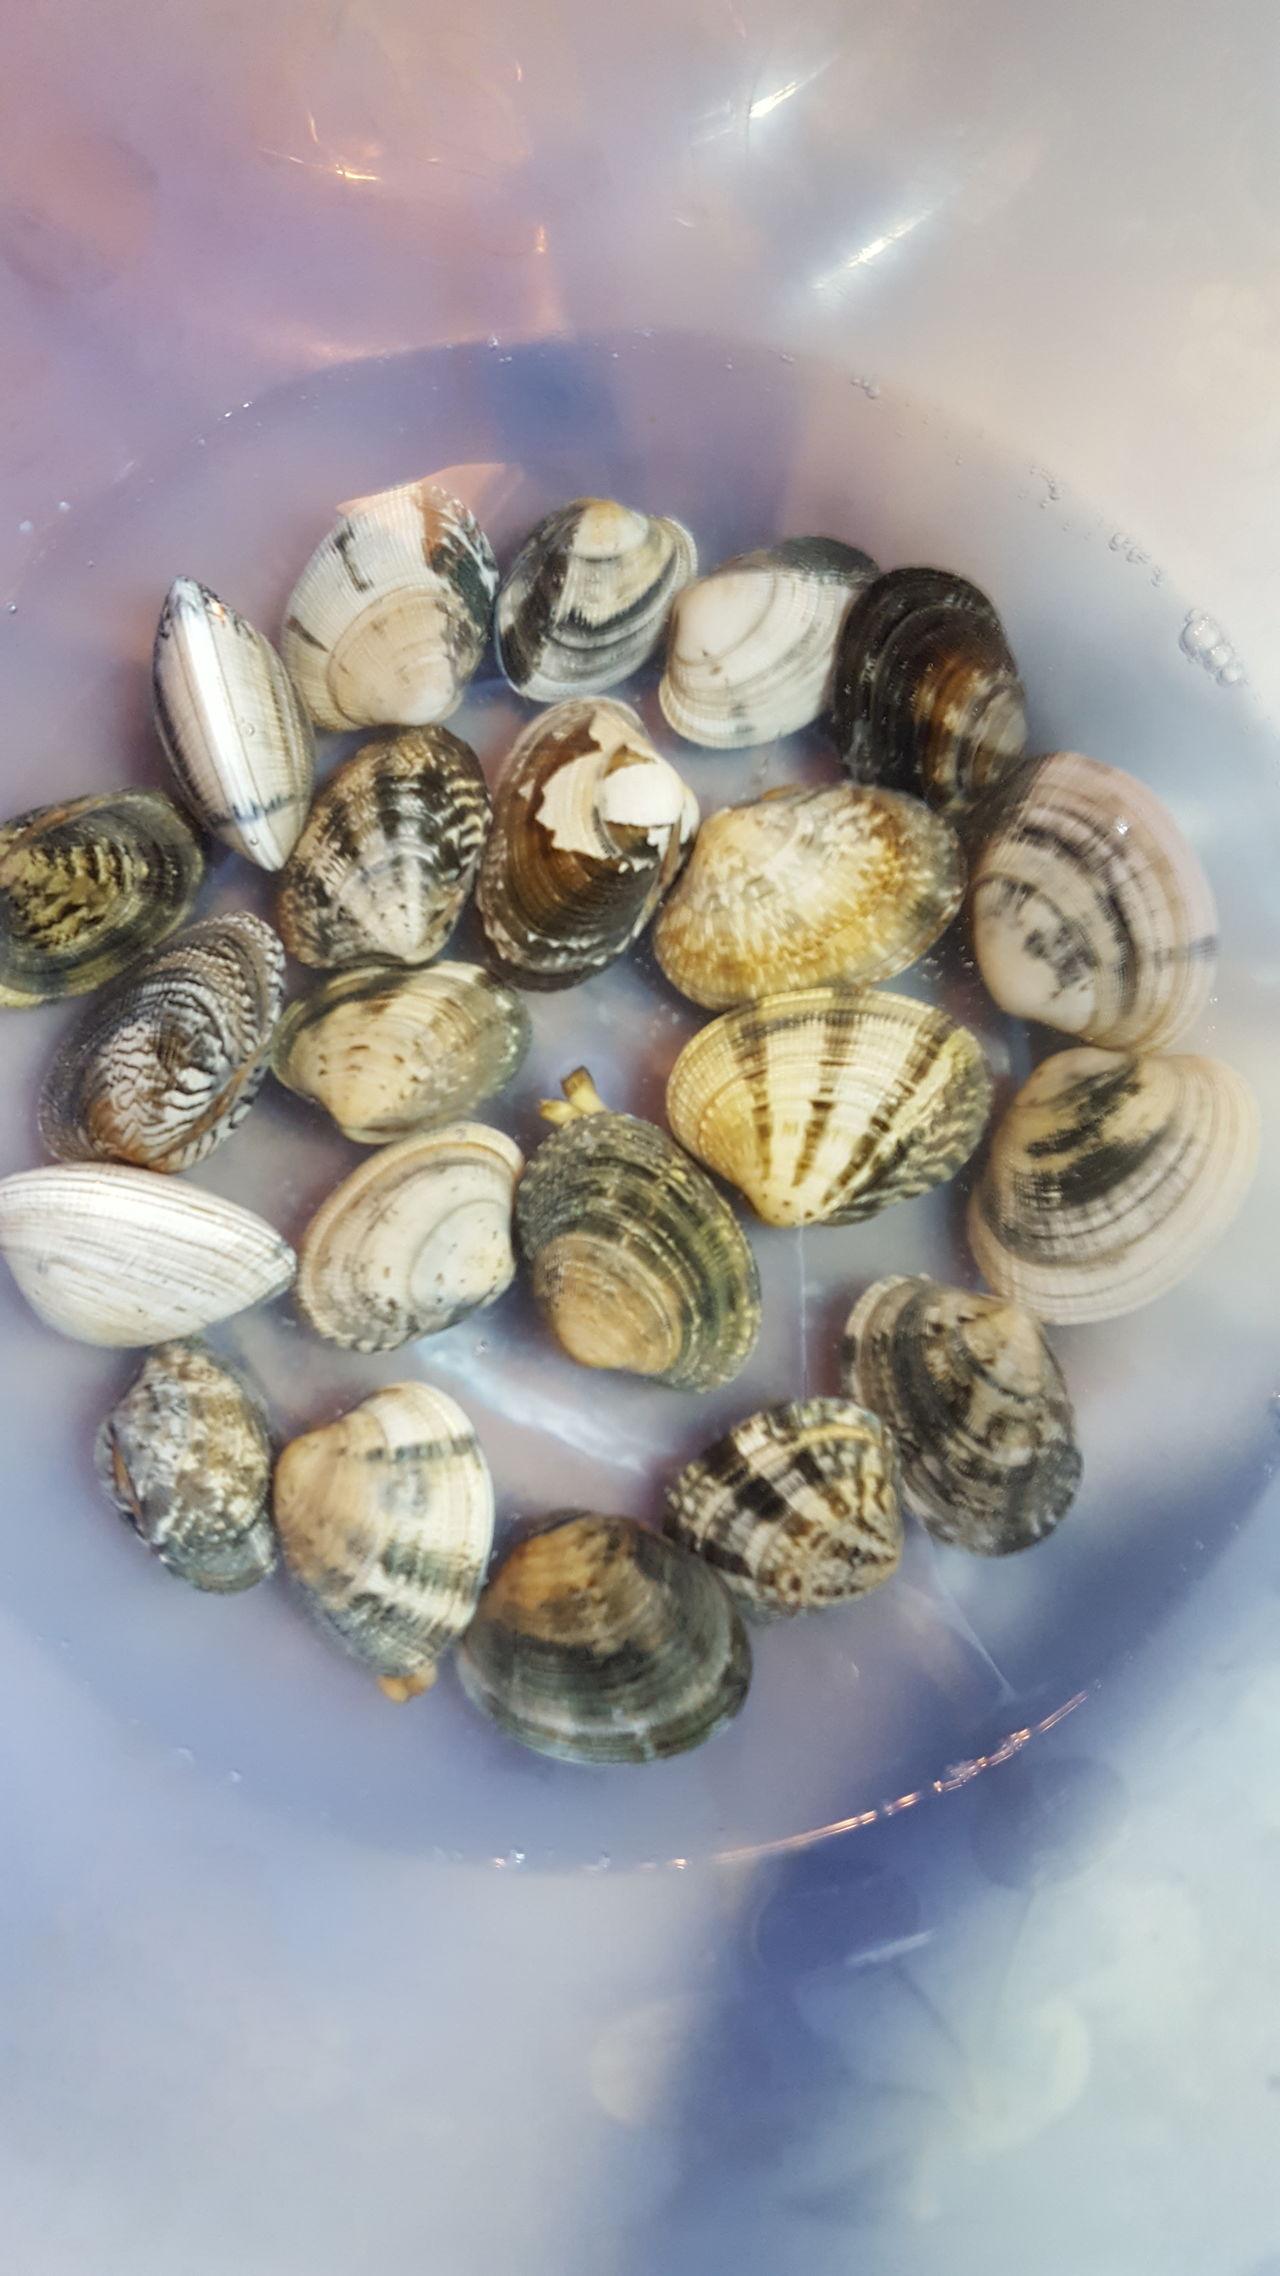 Seashell No People Nature Close-up Healthy Eating Sea Life Indoors  Day Freshness Vongole Food♡ Italia Napoli Napoli ❤ Italy🇮🇹 Freshness